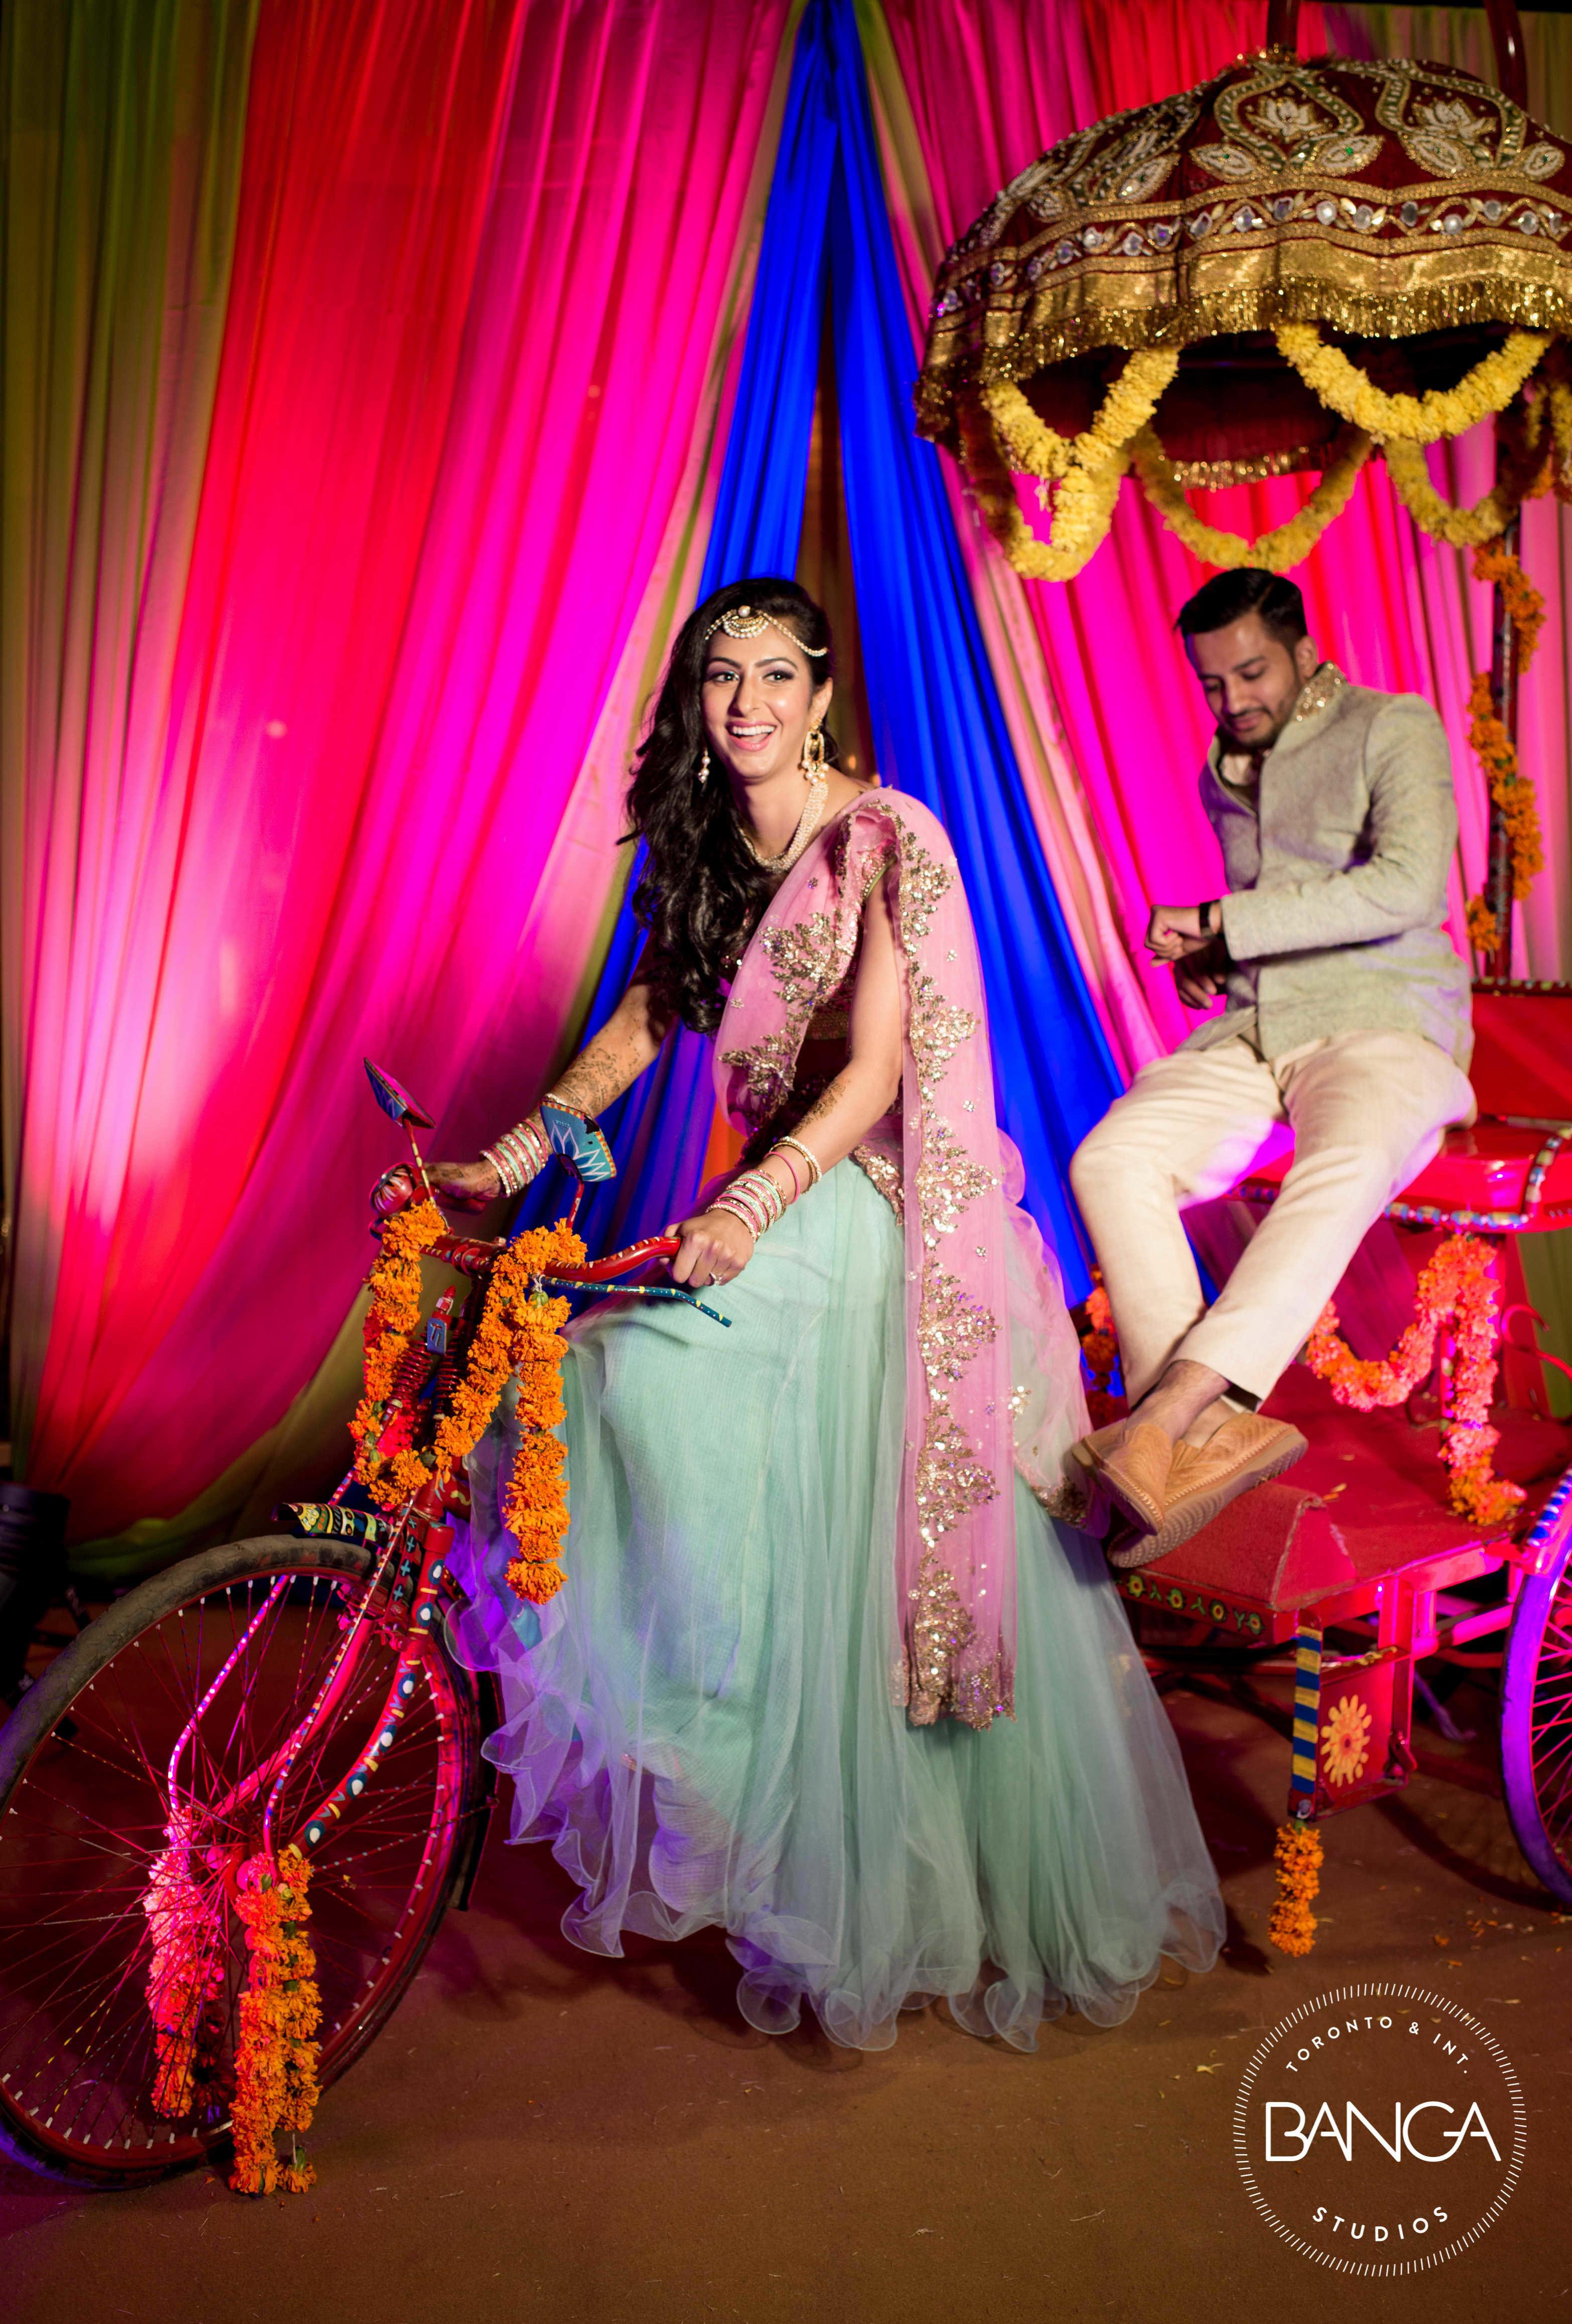 the couple entry!:anita dongre timeless, shyamal and bhumika, anushree reddy, banga studios